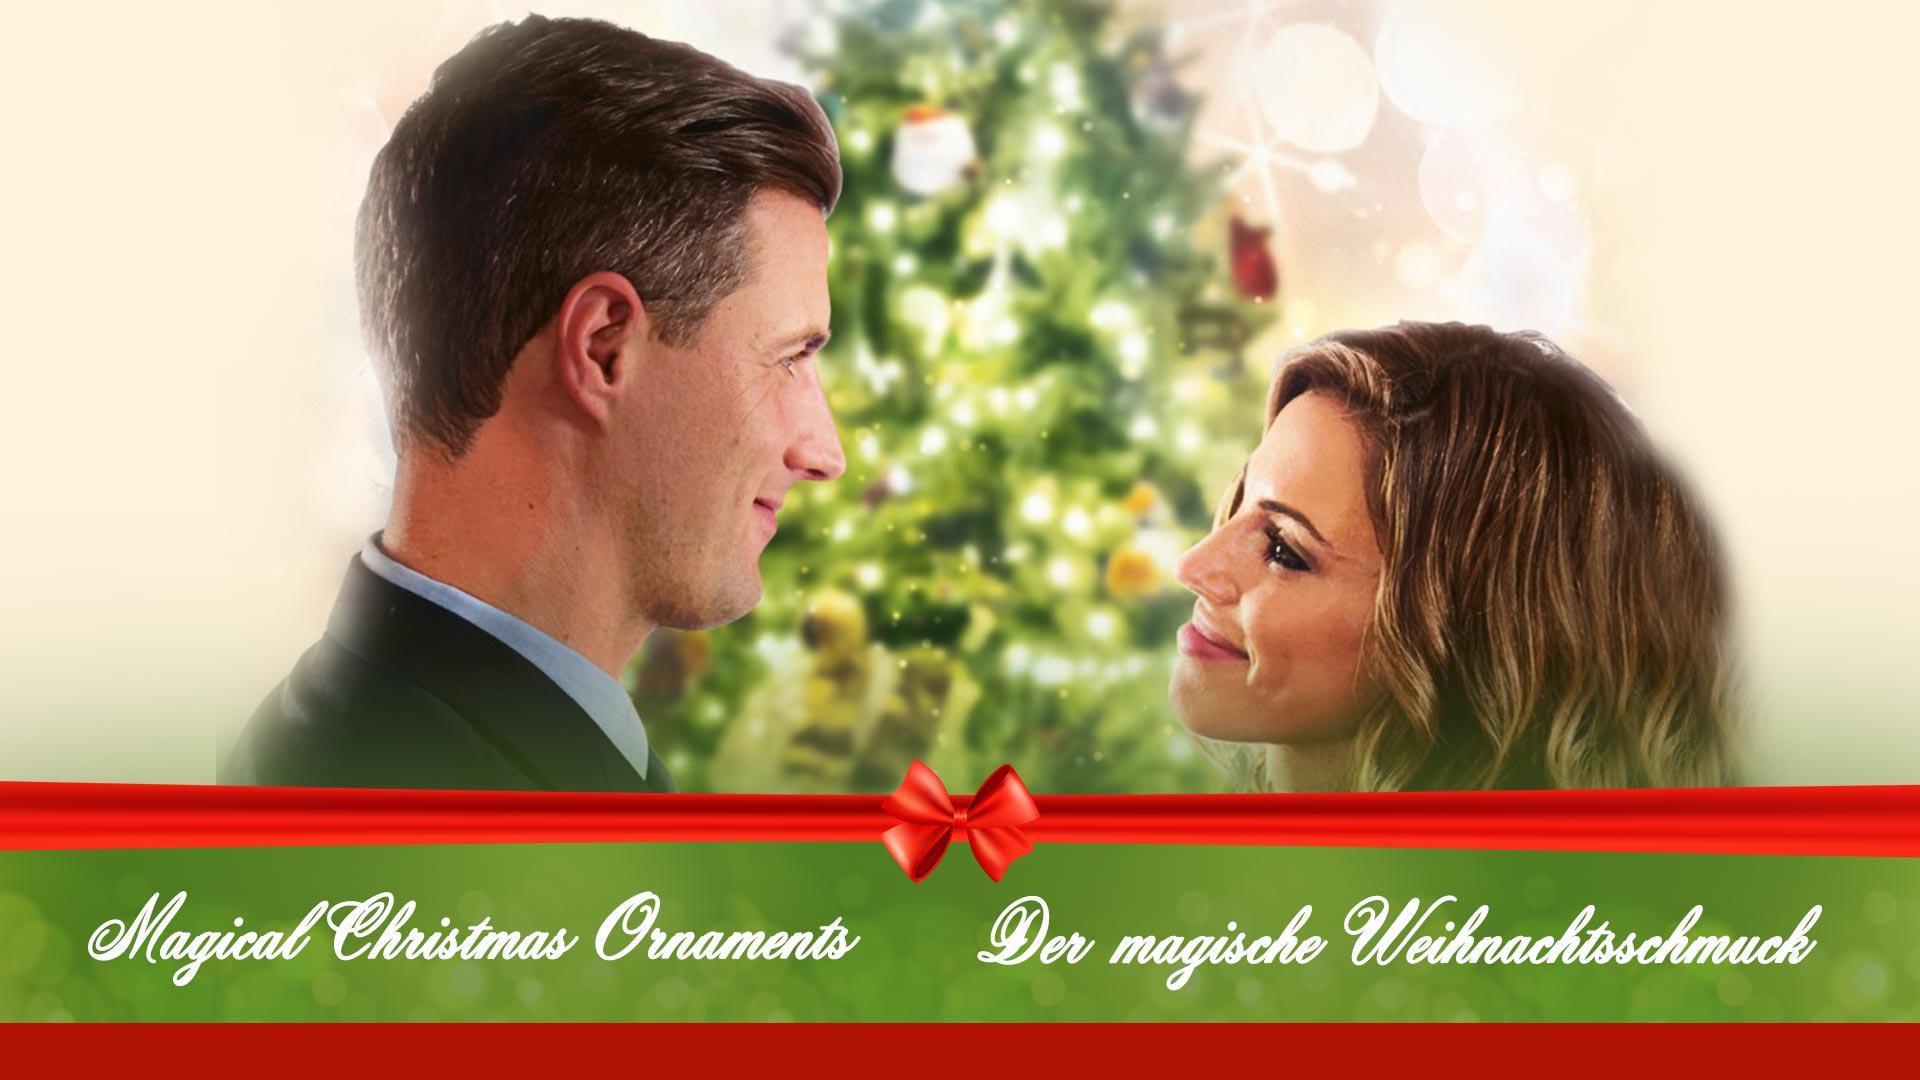 Magical Christmas Ornaments - Der magische Weihnachtsschmuck